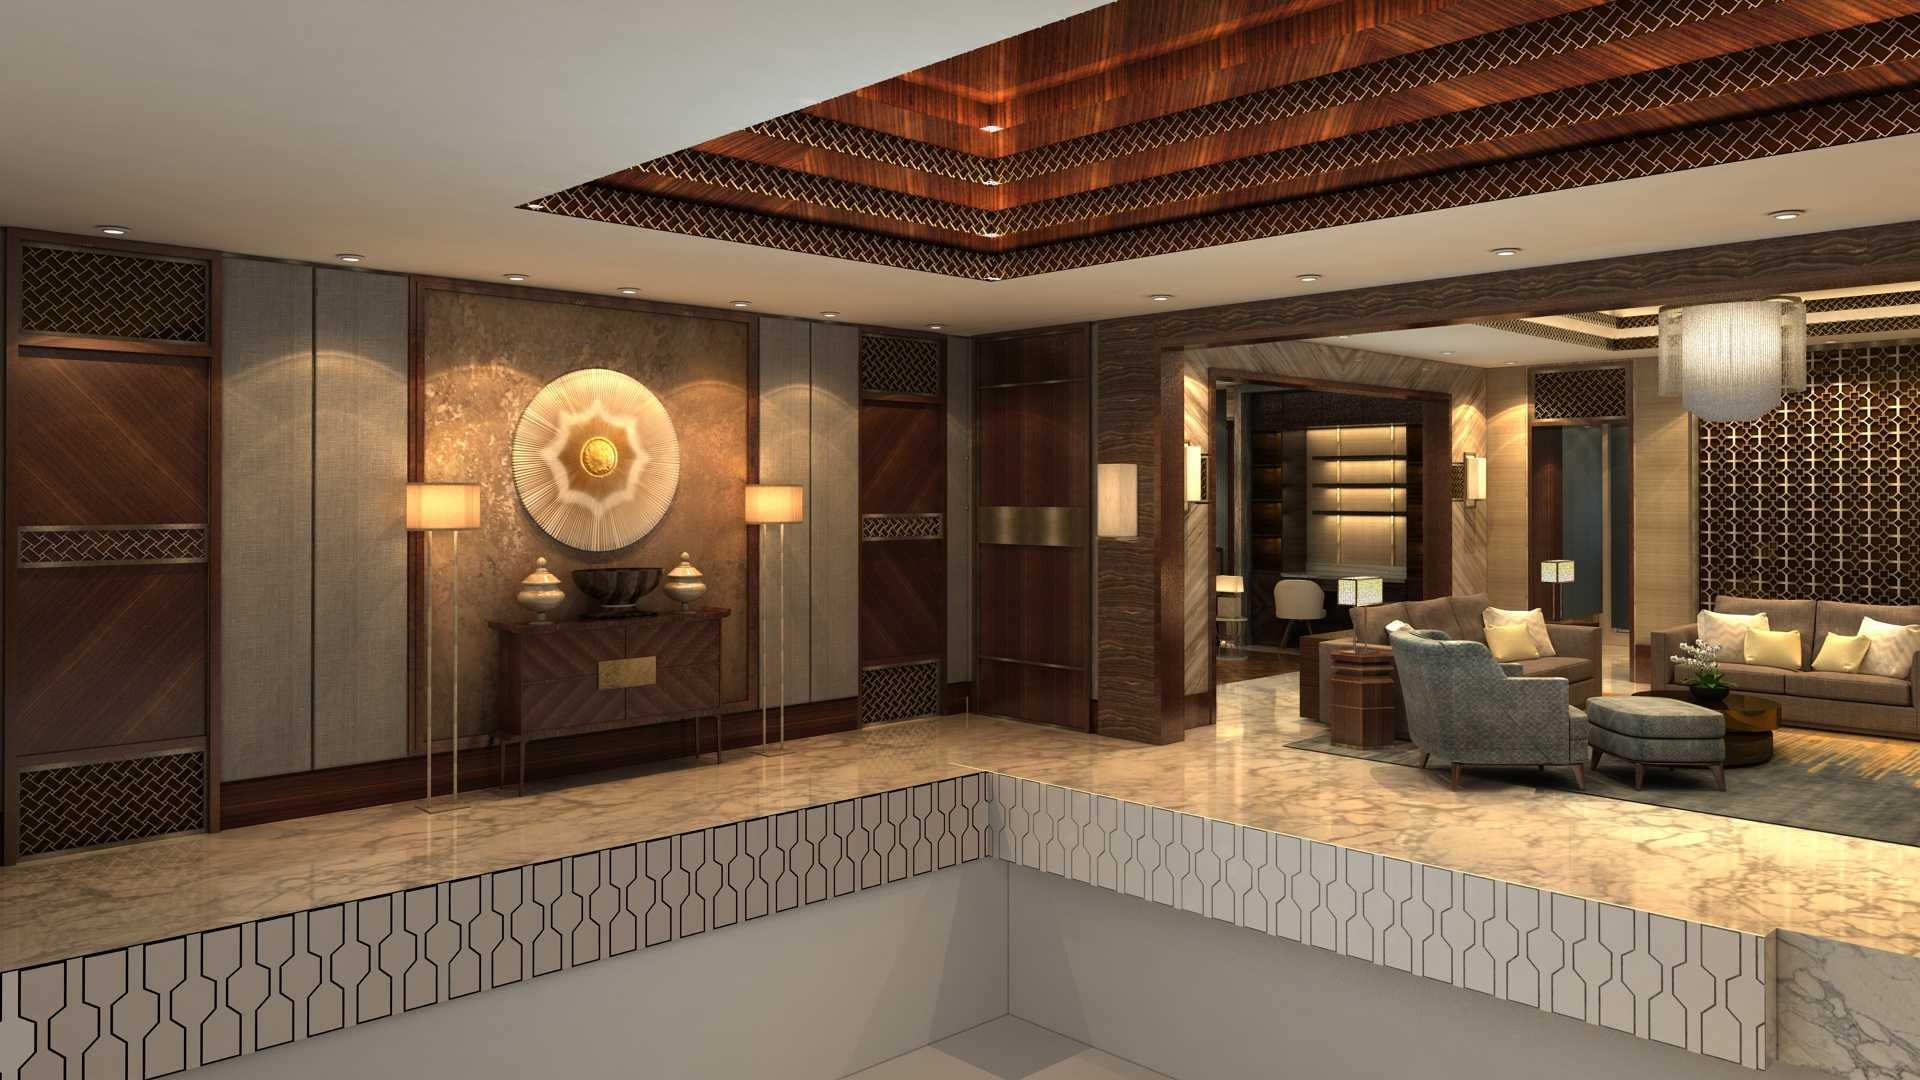 Vin•da•te Mayang Permai Residence Ii - Residential Project (Artist Impression - Construction In Progress) Pantai Indah Kapuk - North Jakarta Pantai Indah Kapuk - North Jakarta Lt Kontemporer  17218